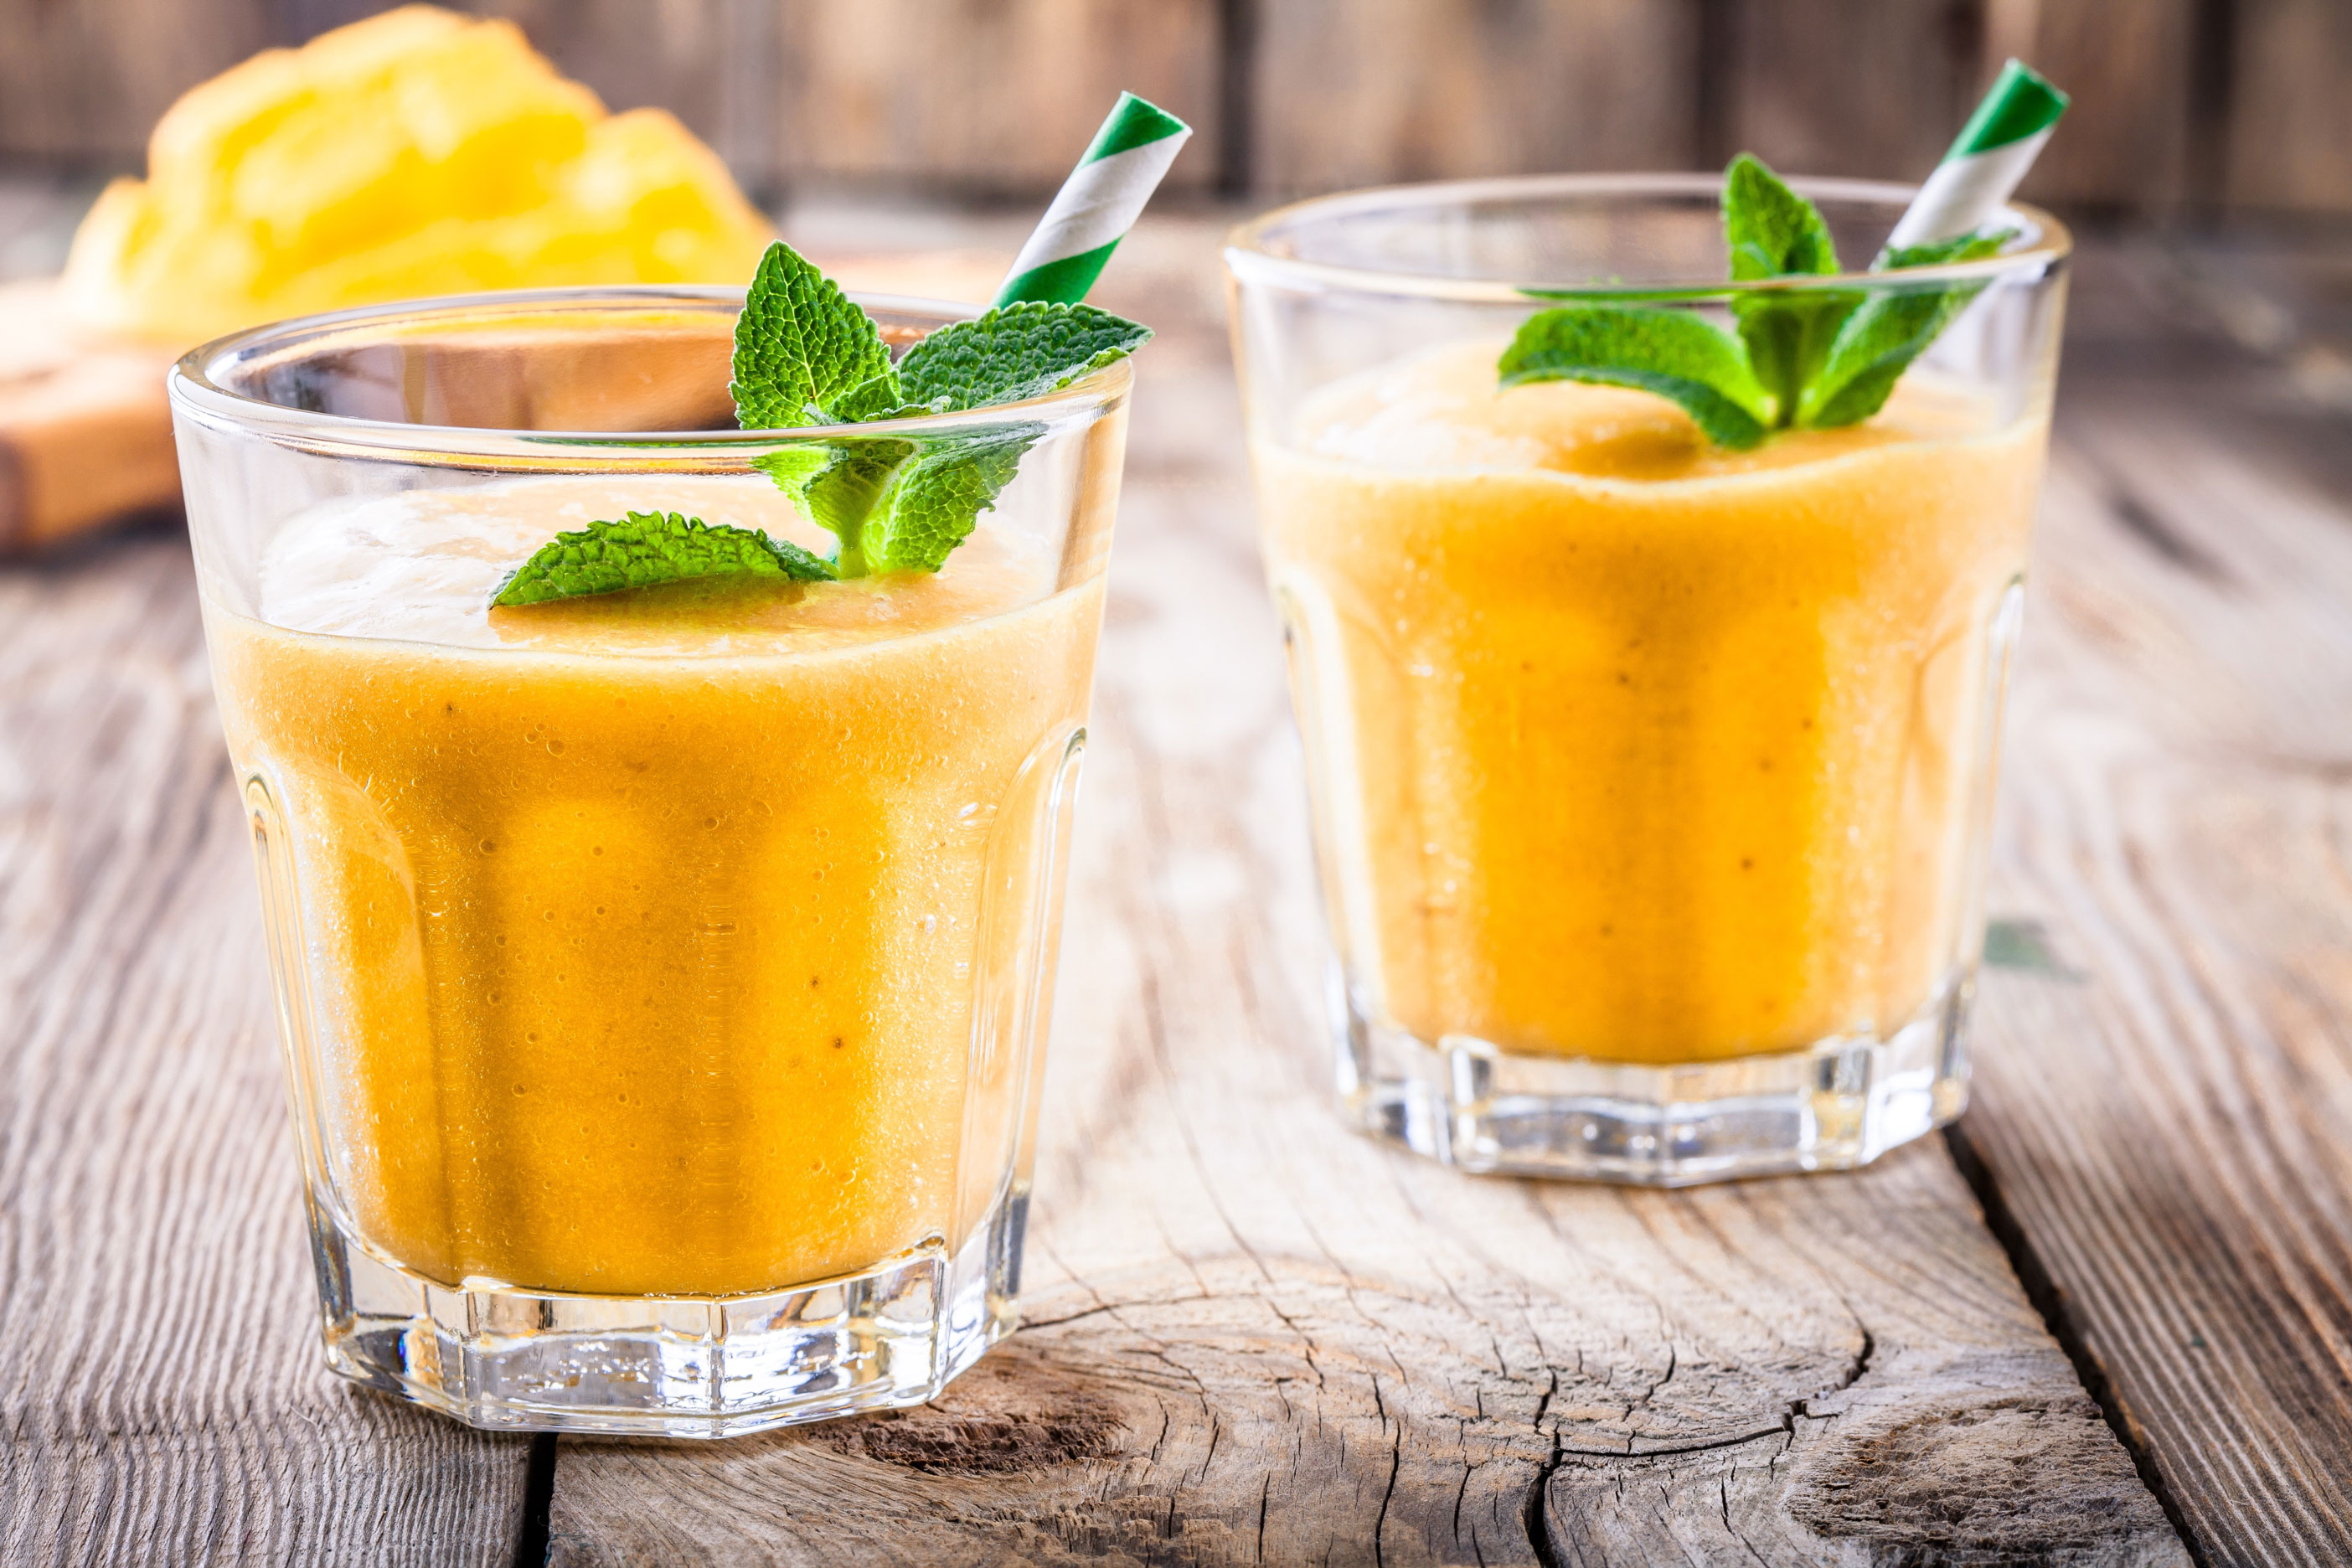 mango pineapple smoothie instructions